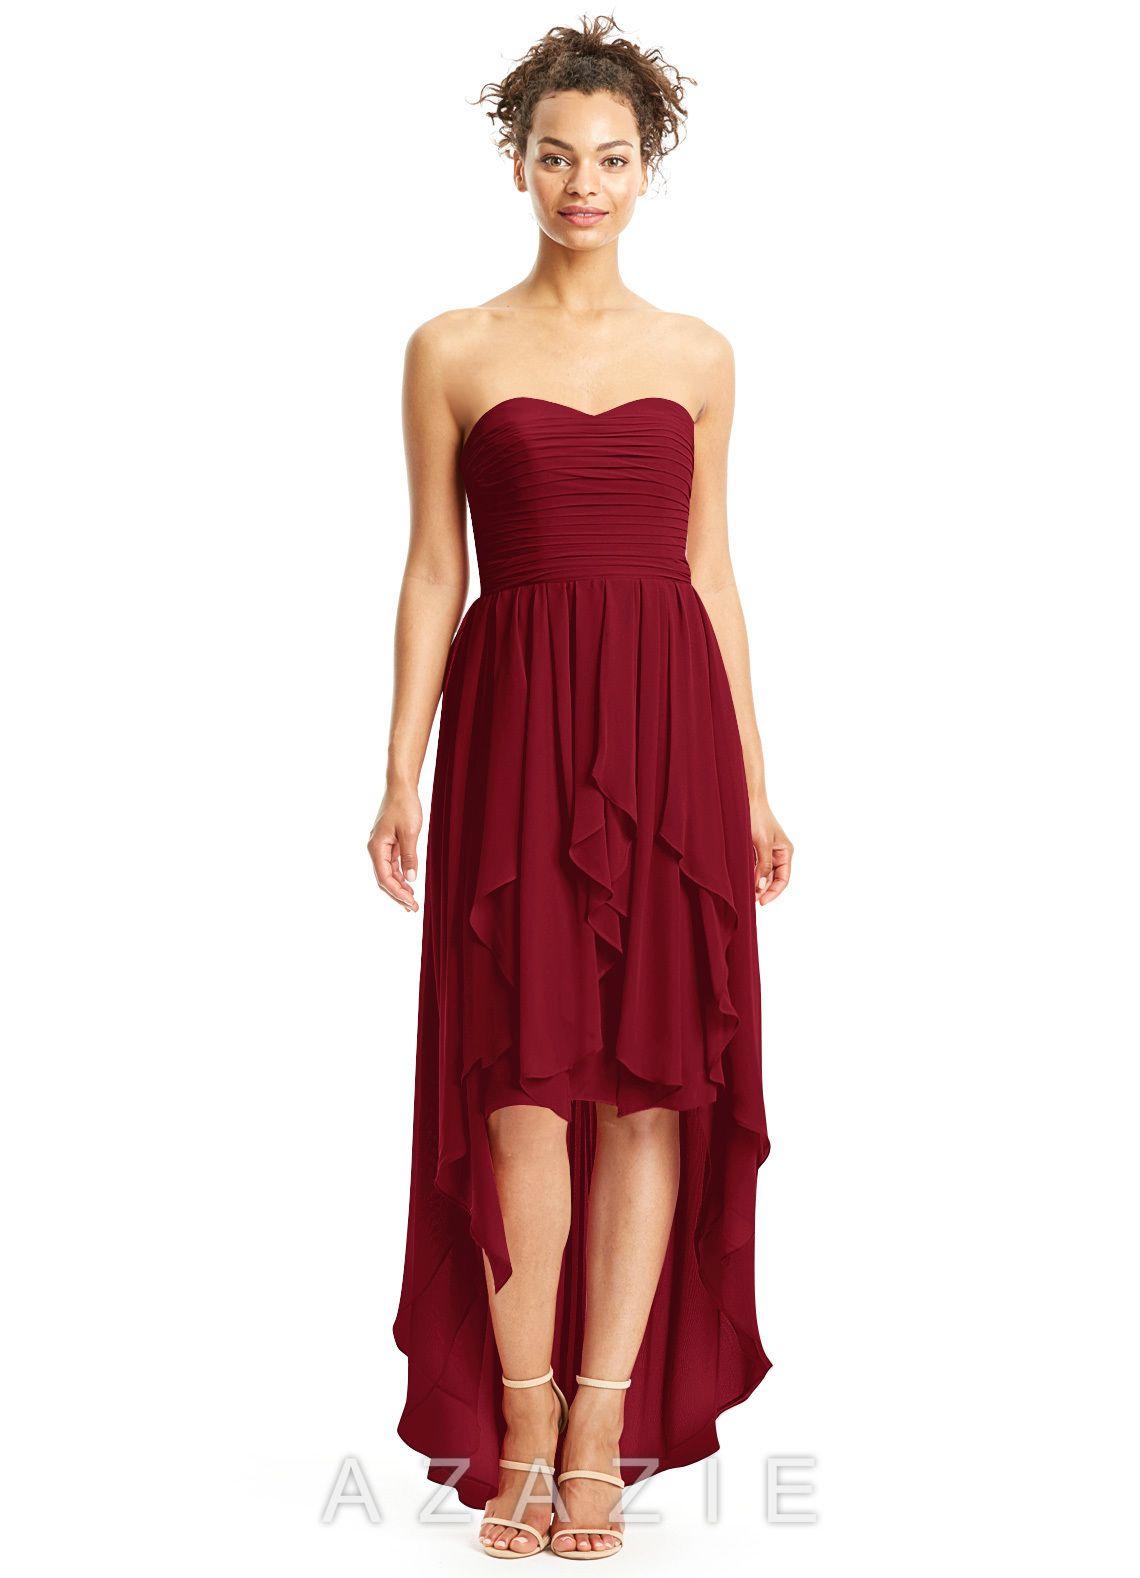 Blue camo wedding dresses  Abbie  Red Wedding  Pinterest  Bridesmaid dresses Bridesmaid and